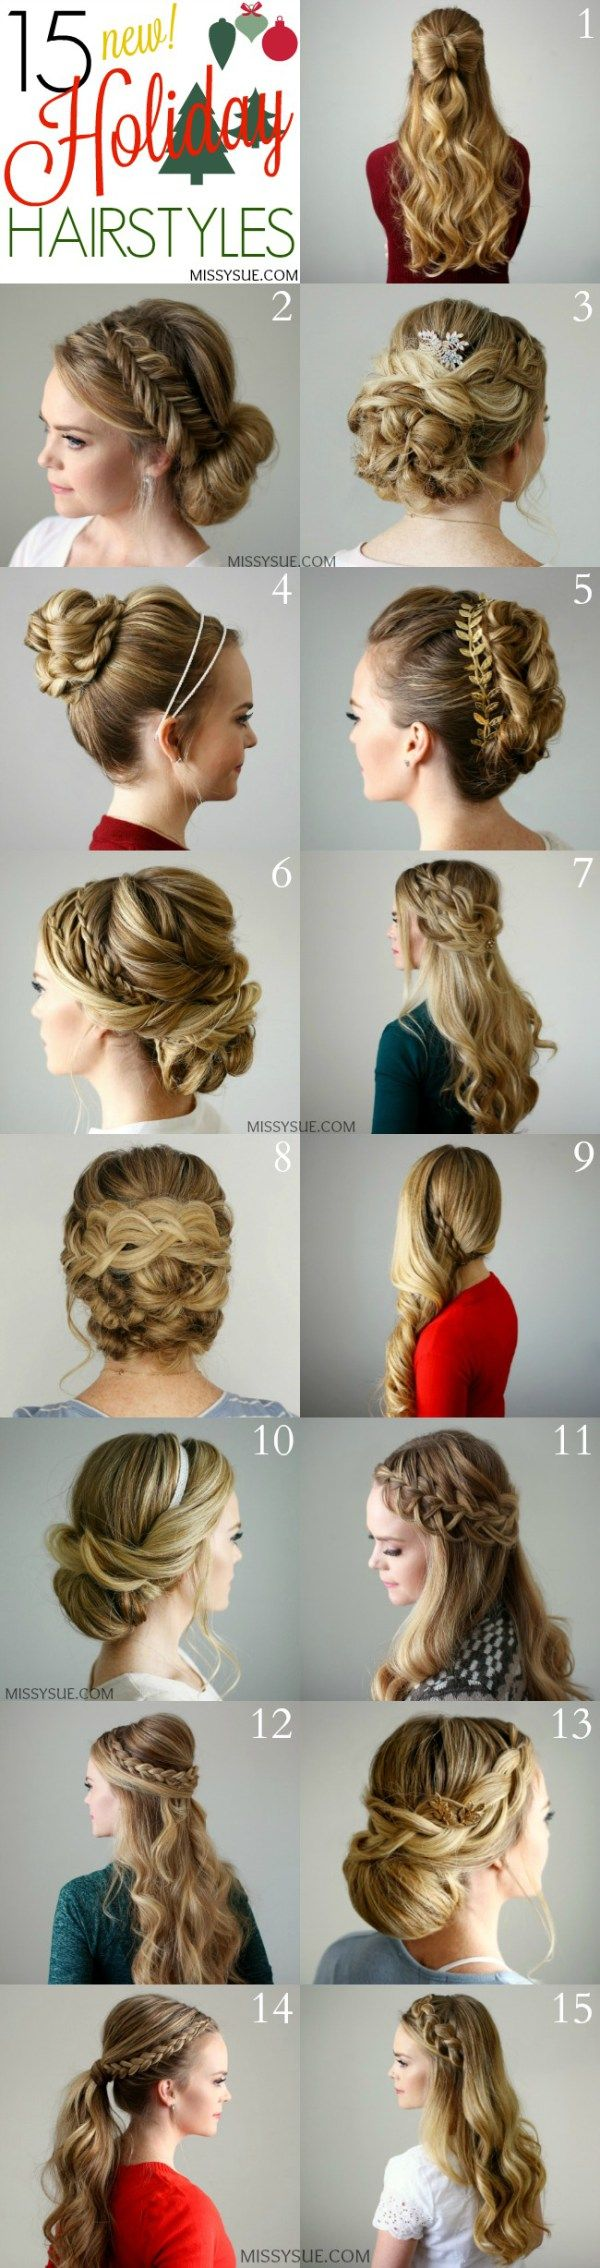 holiday hairstyles missysue bridesmaid pinterest